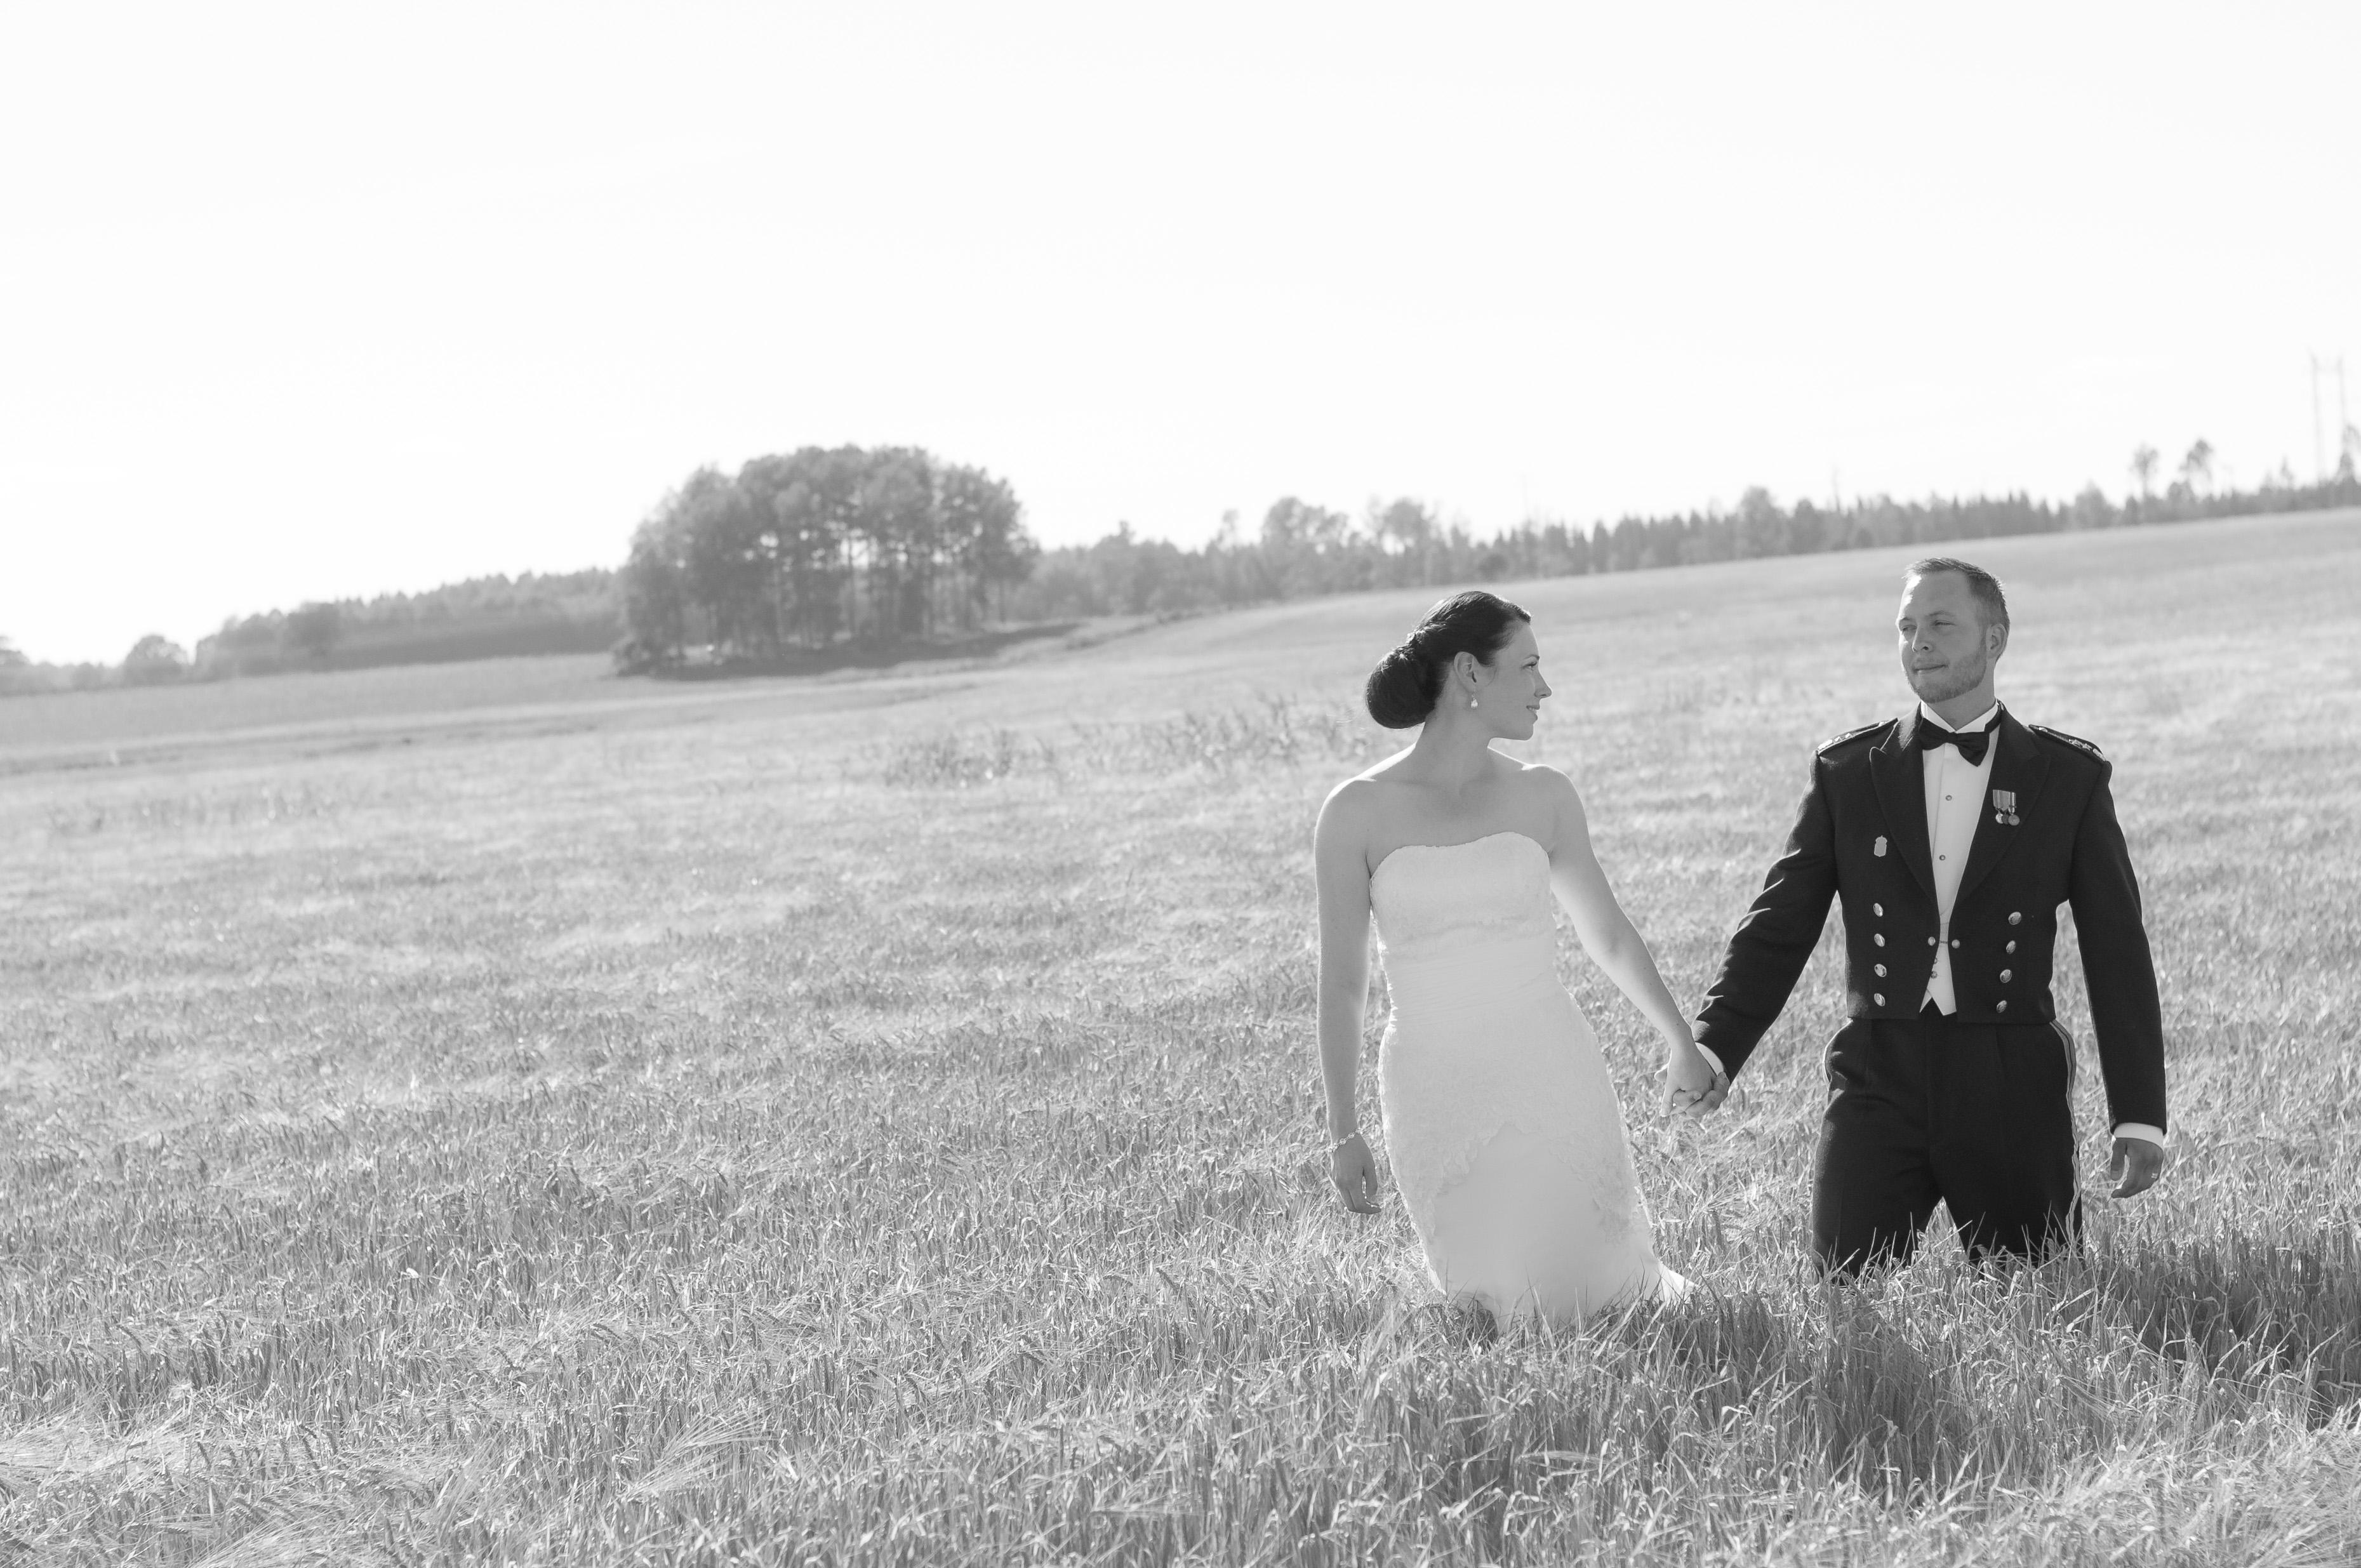 wennborg-photography-augustibrollop-47